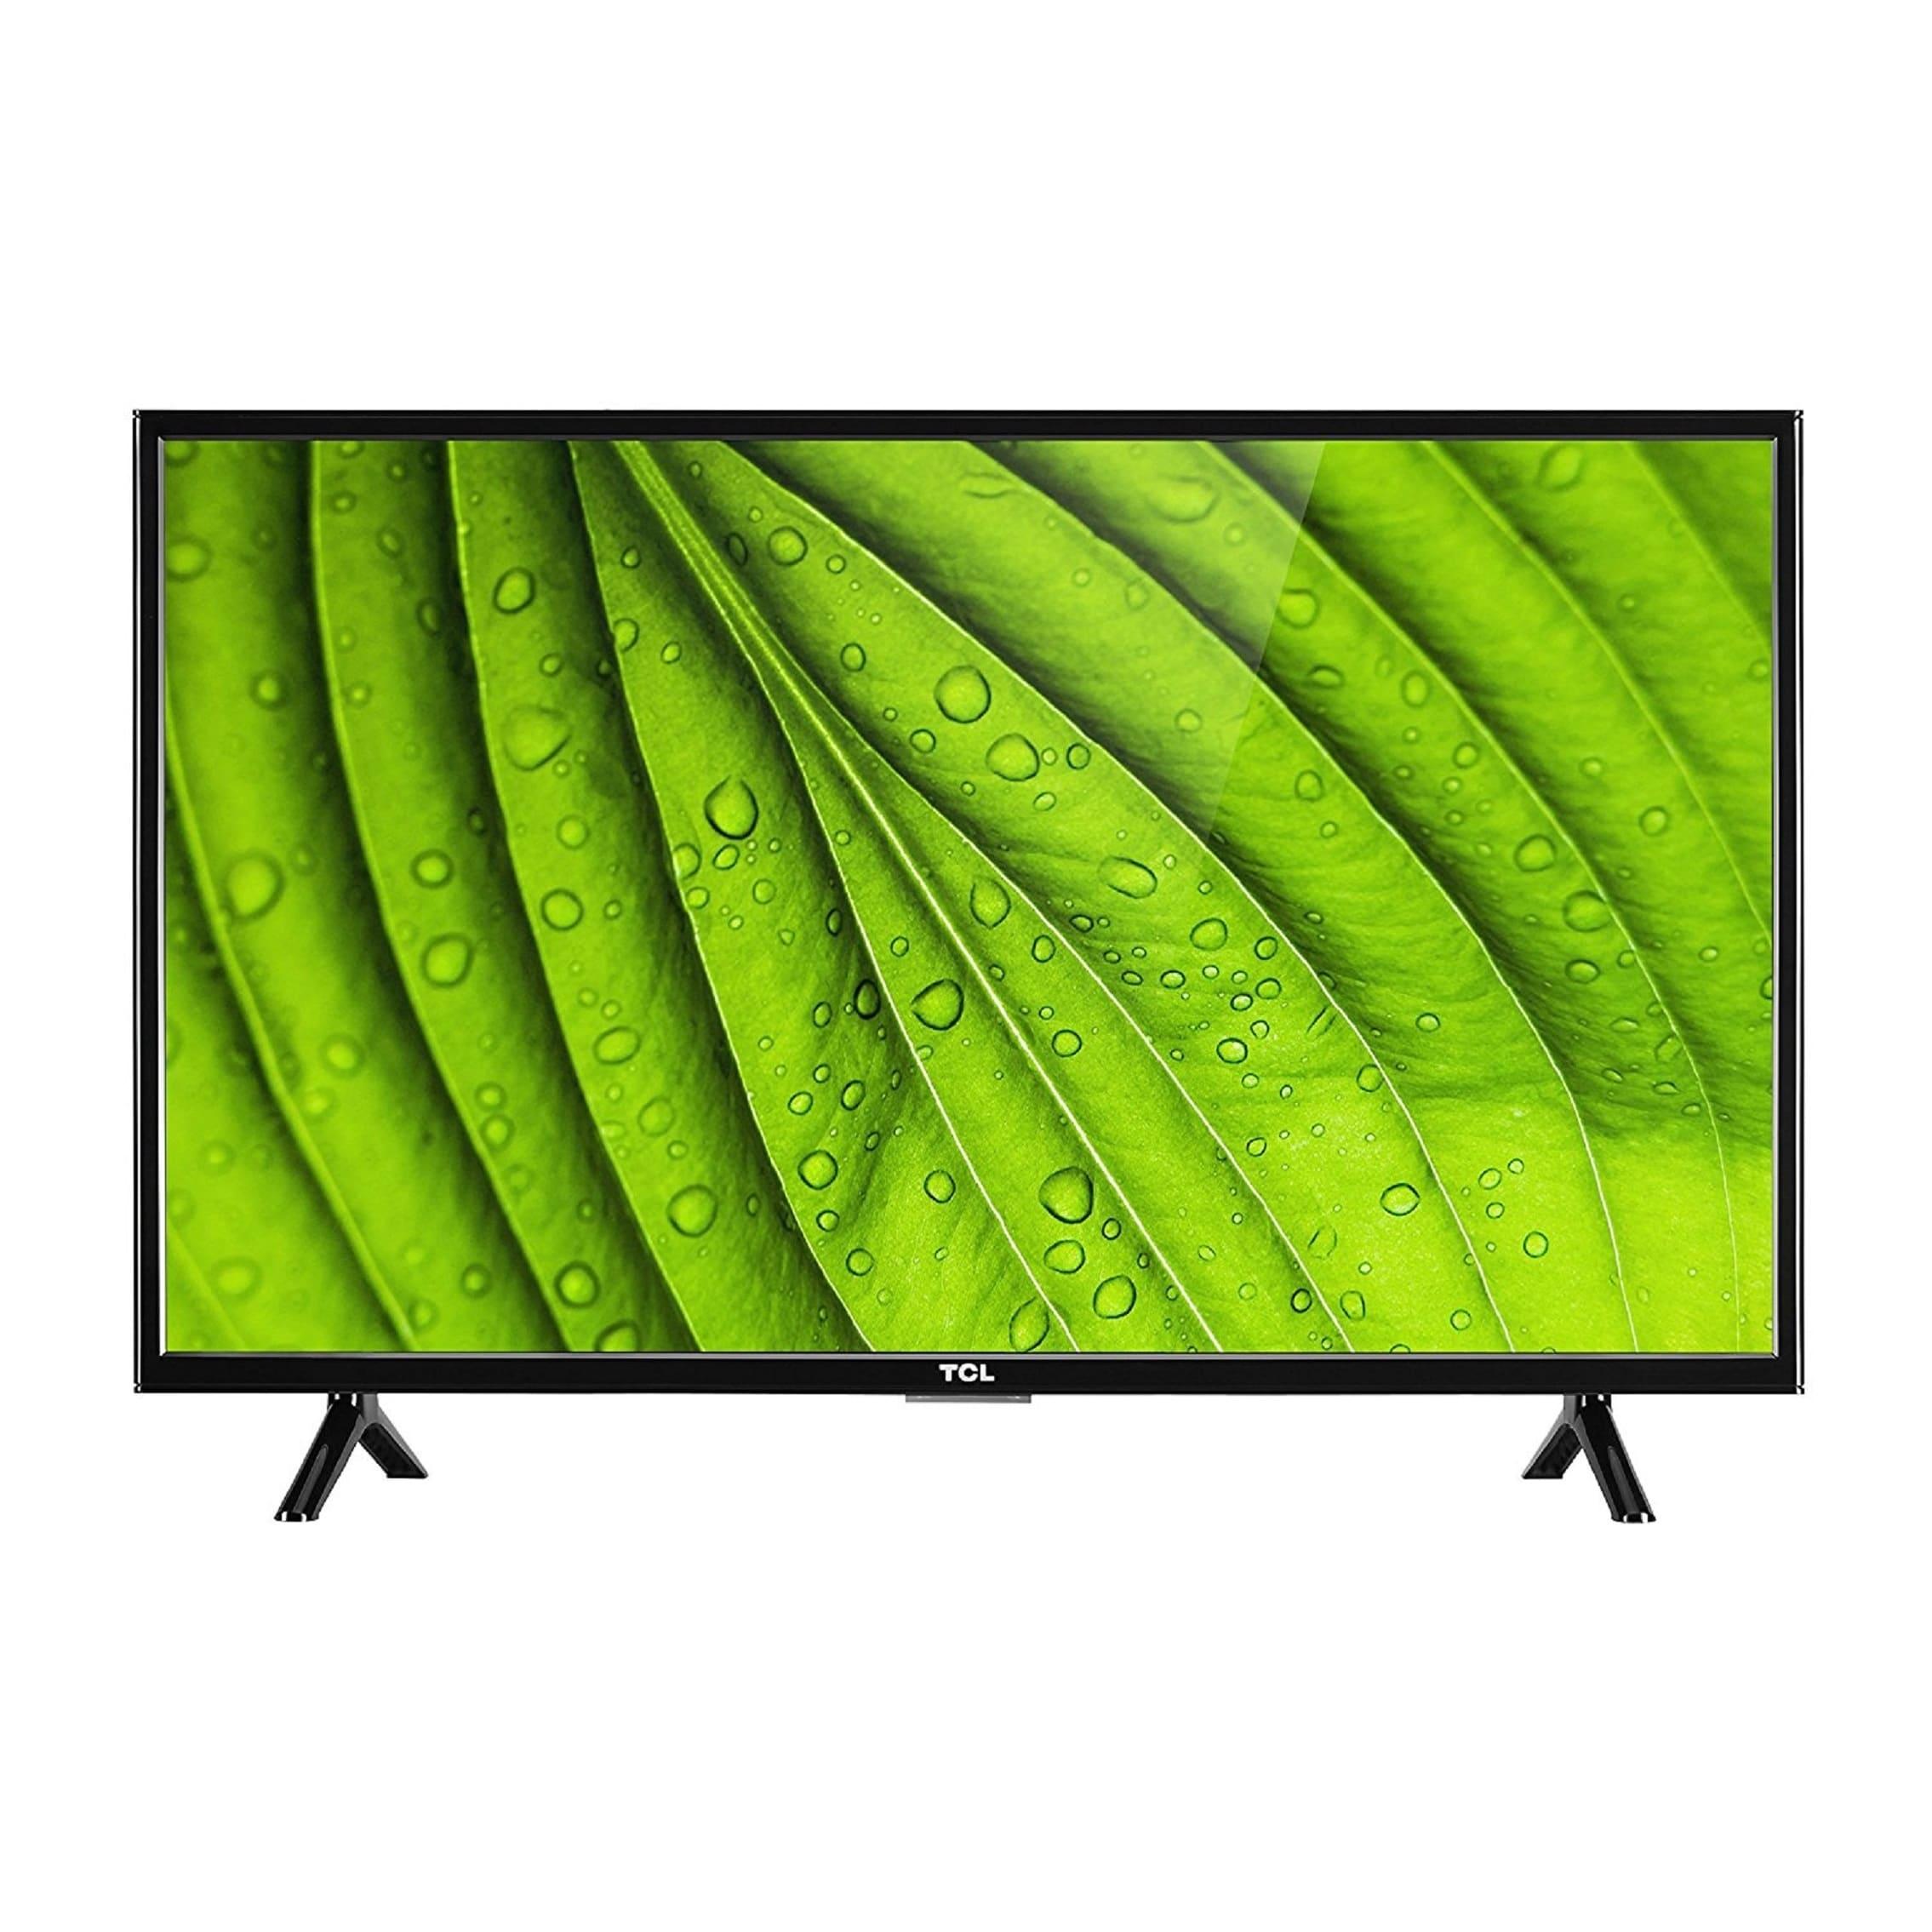 2017 Model TCL 49D100 49-Inch 1080p LED TV